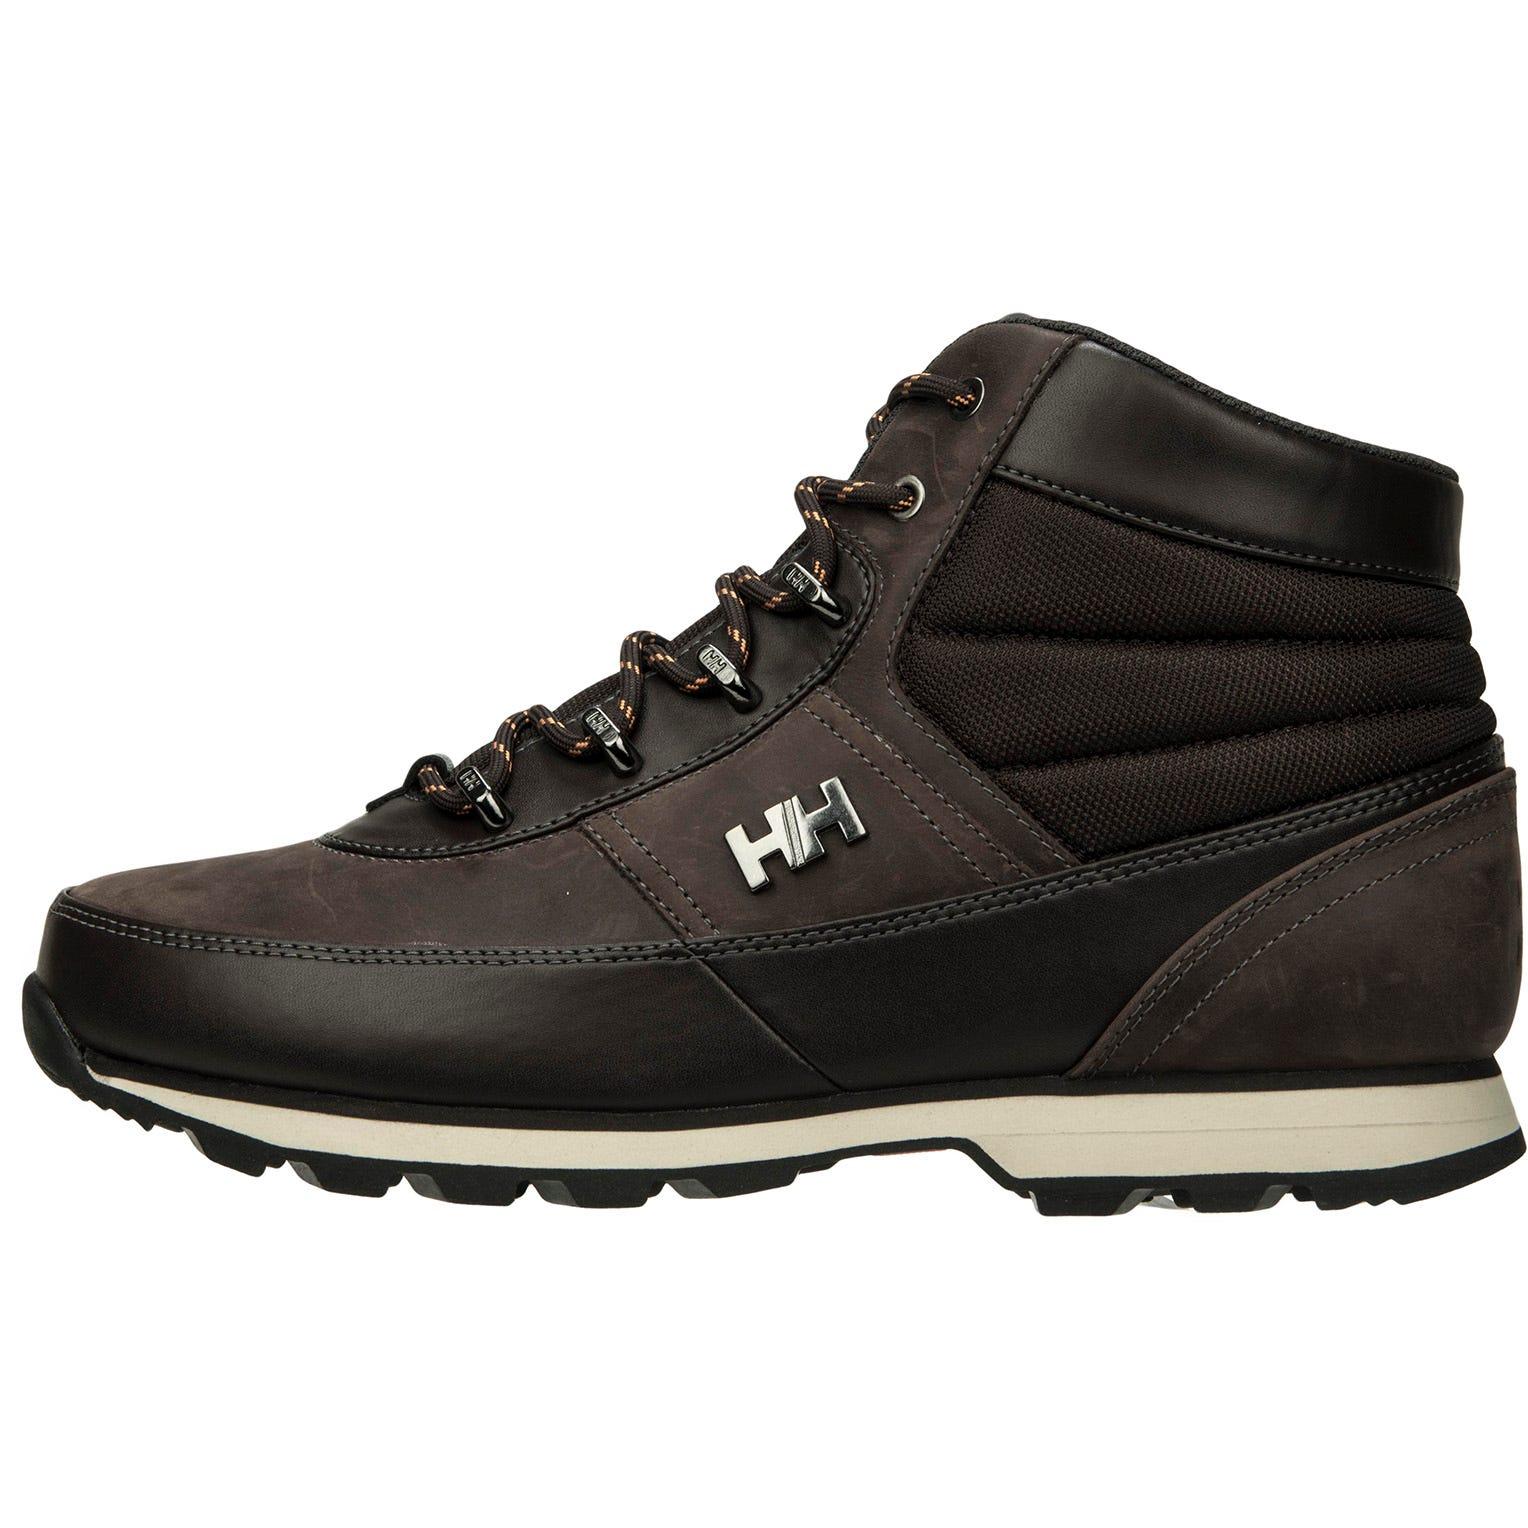 Helly Hansen Woodlands Casual Shoe Brown 42.5/9